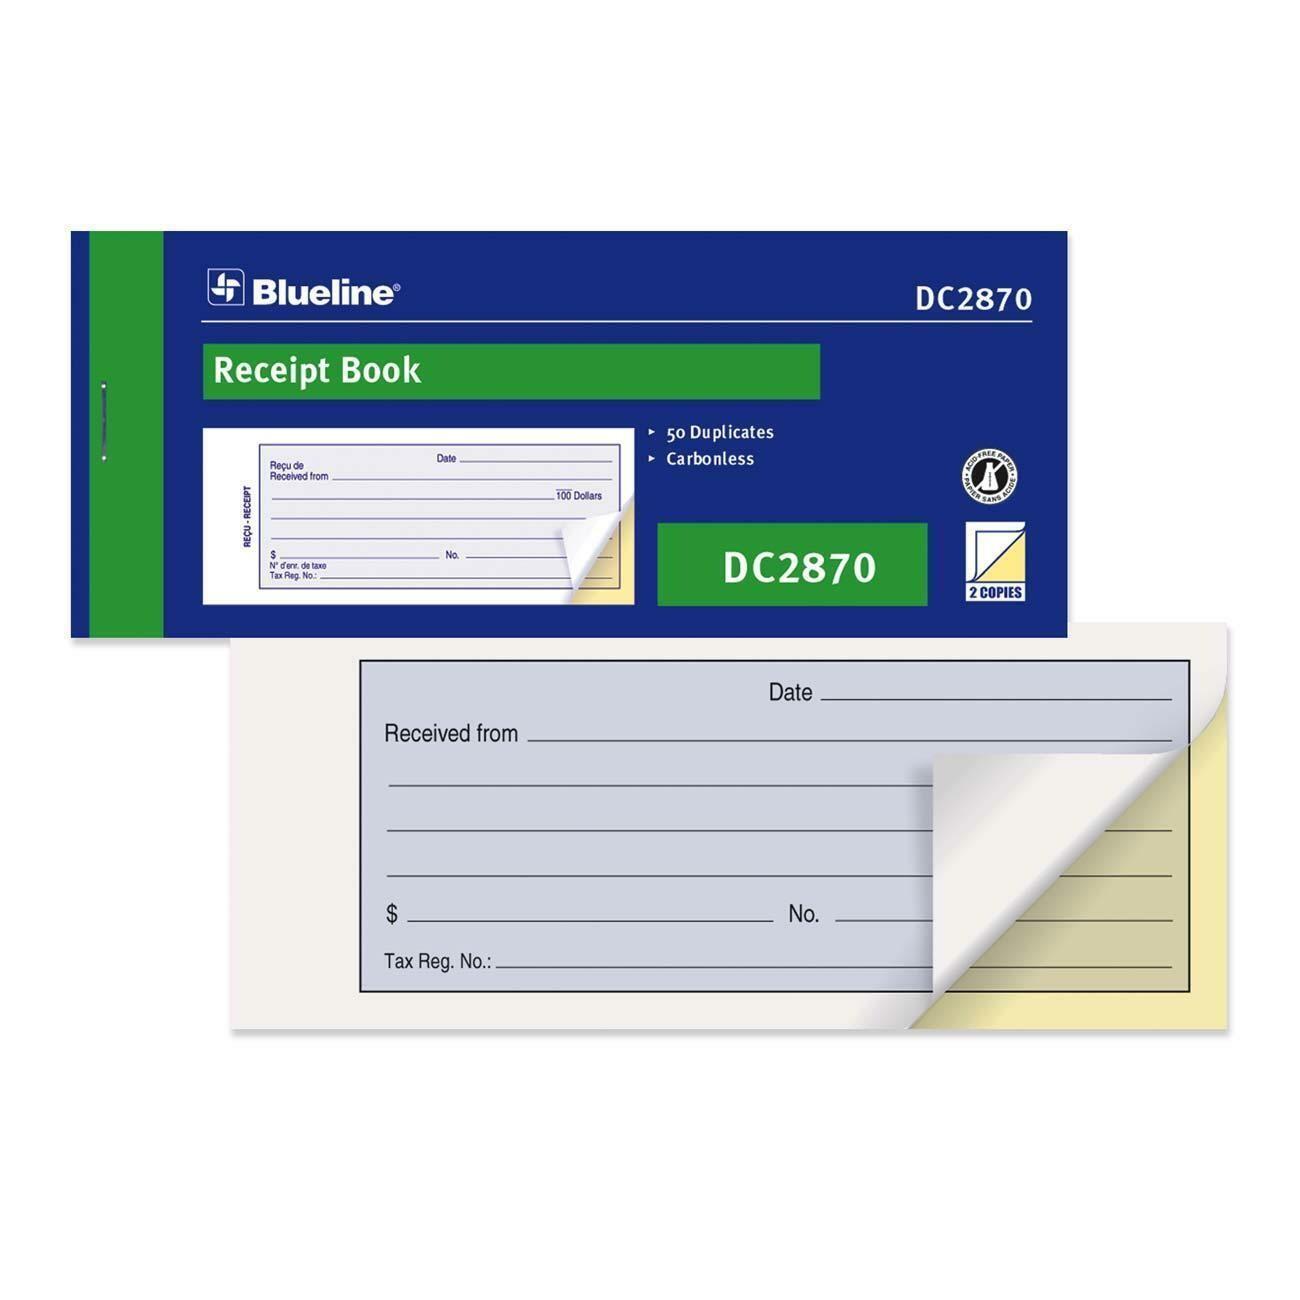 "Receipt Book, Blueline 50 Duplicates, 6 3/4"" x 2 3/4"""